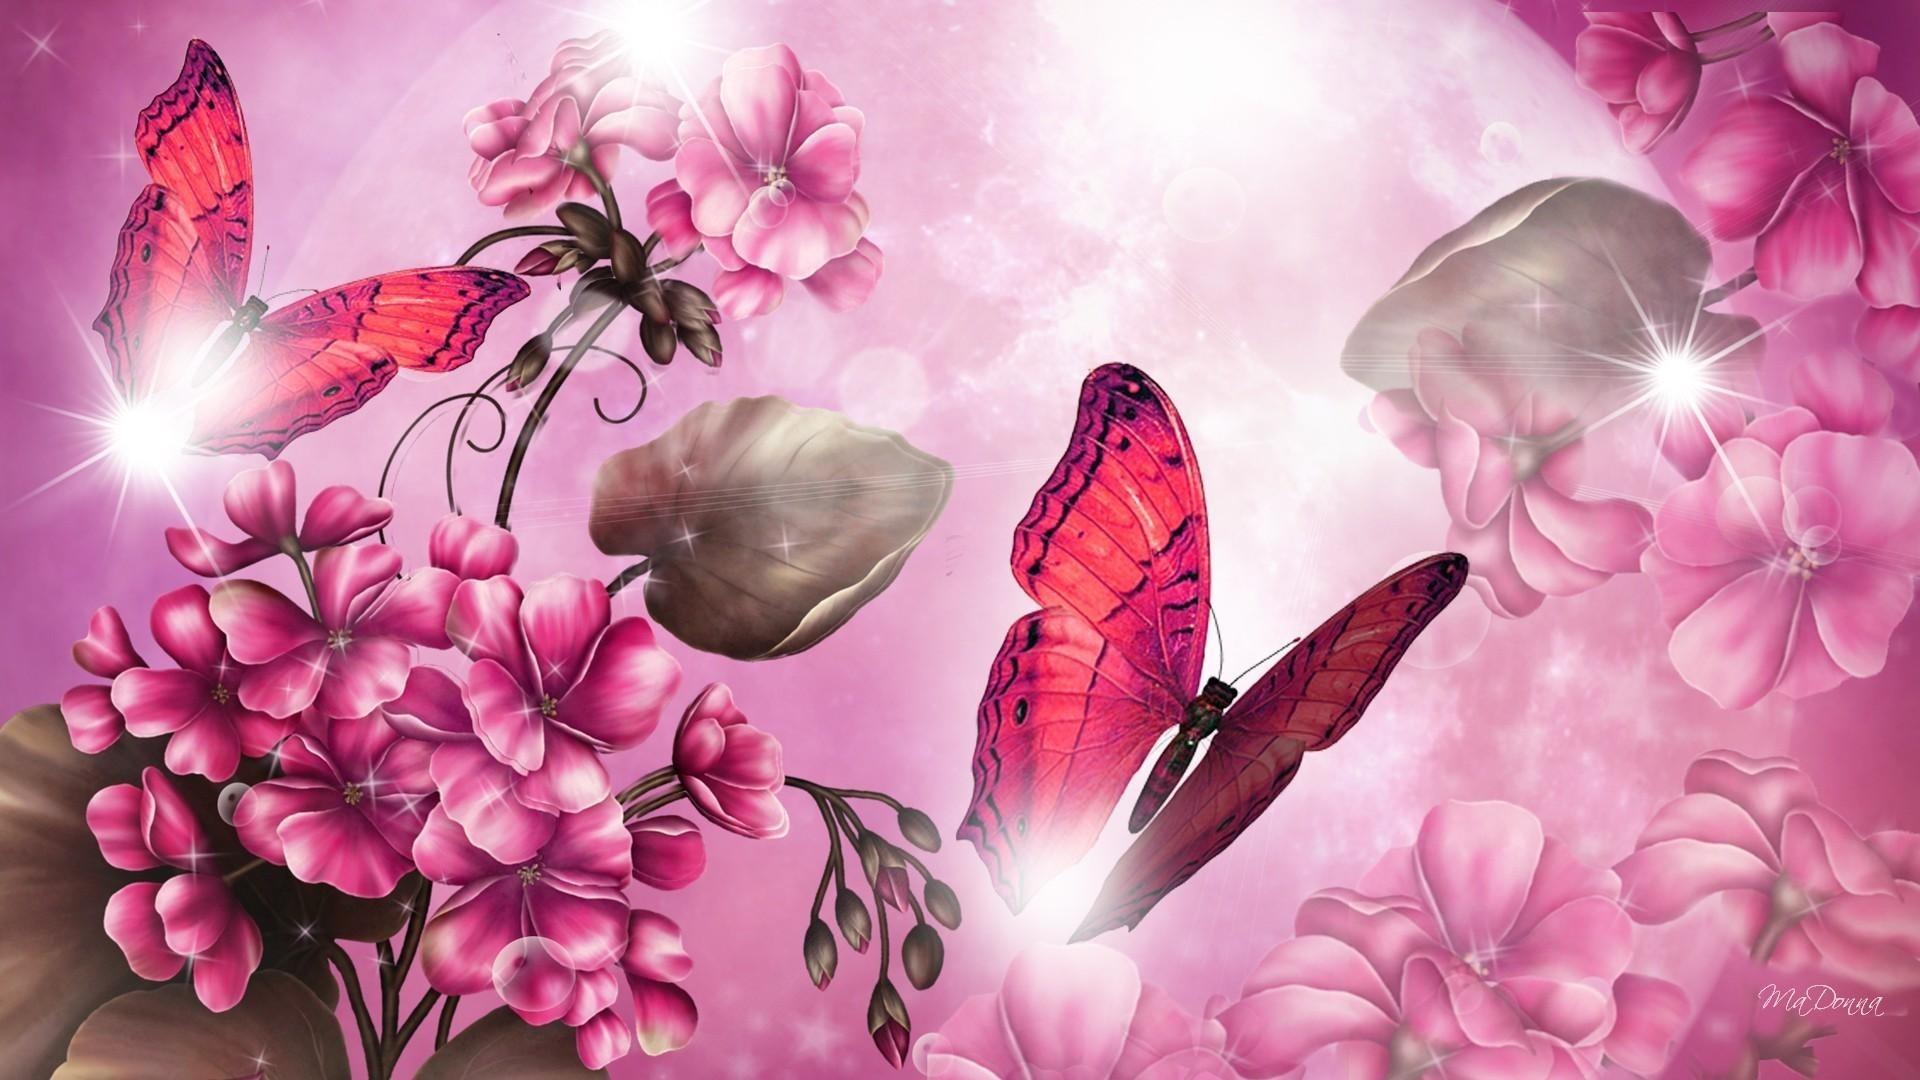 Pink Butterfly Wallpaper theme